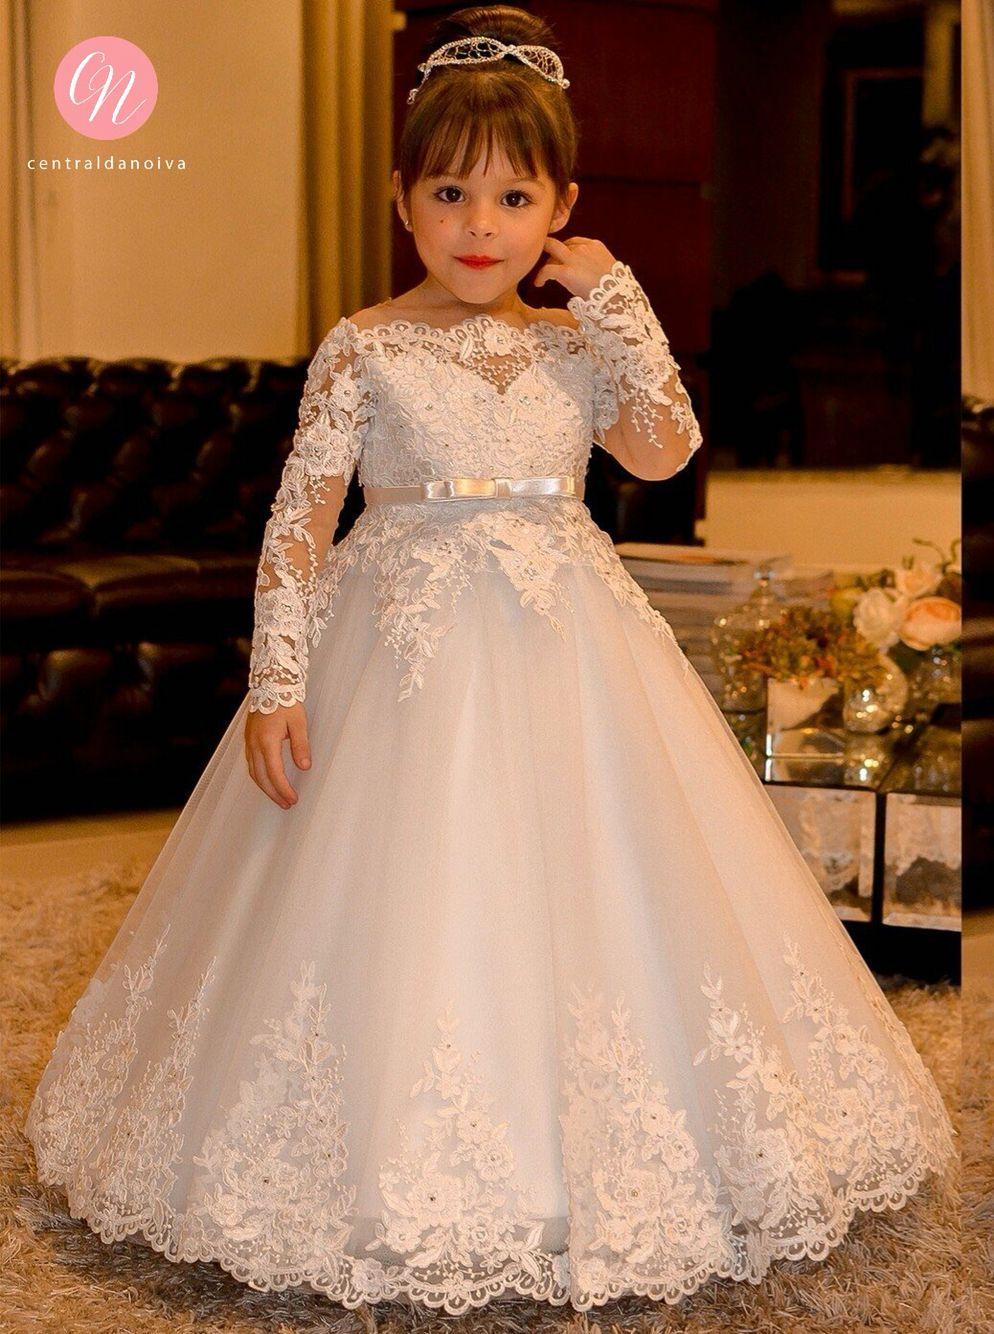 Pin de rosario Ramirez en Sofi | Pinterest | Vestidos de niñas ...